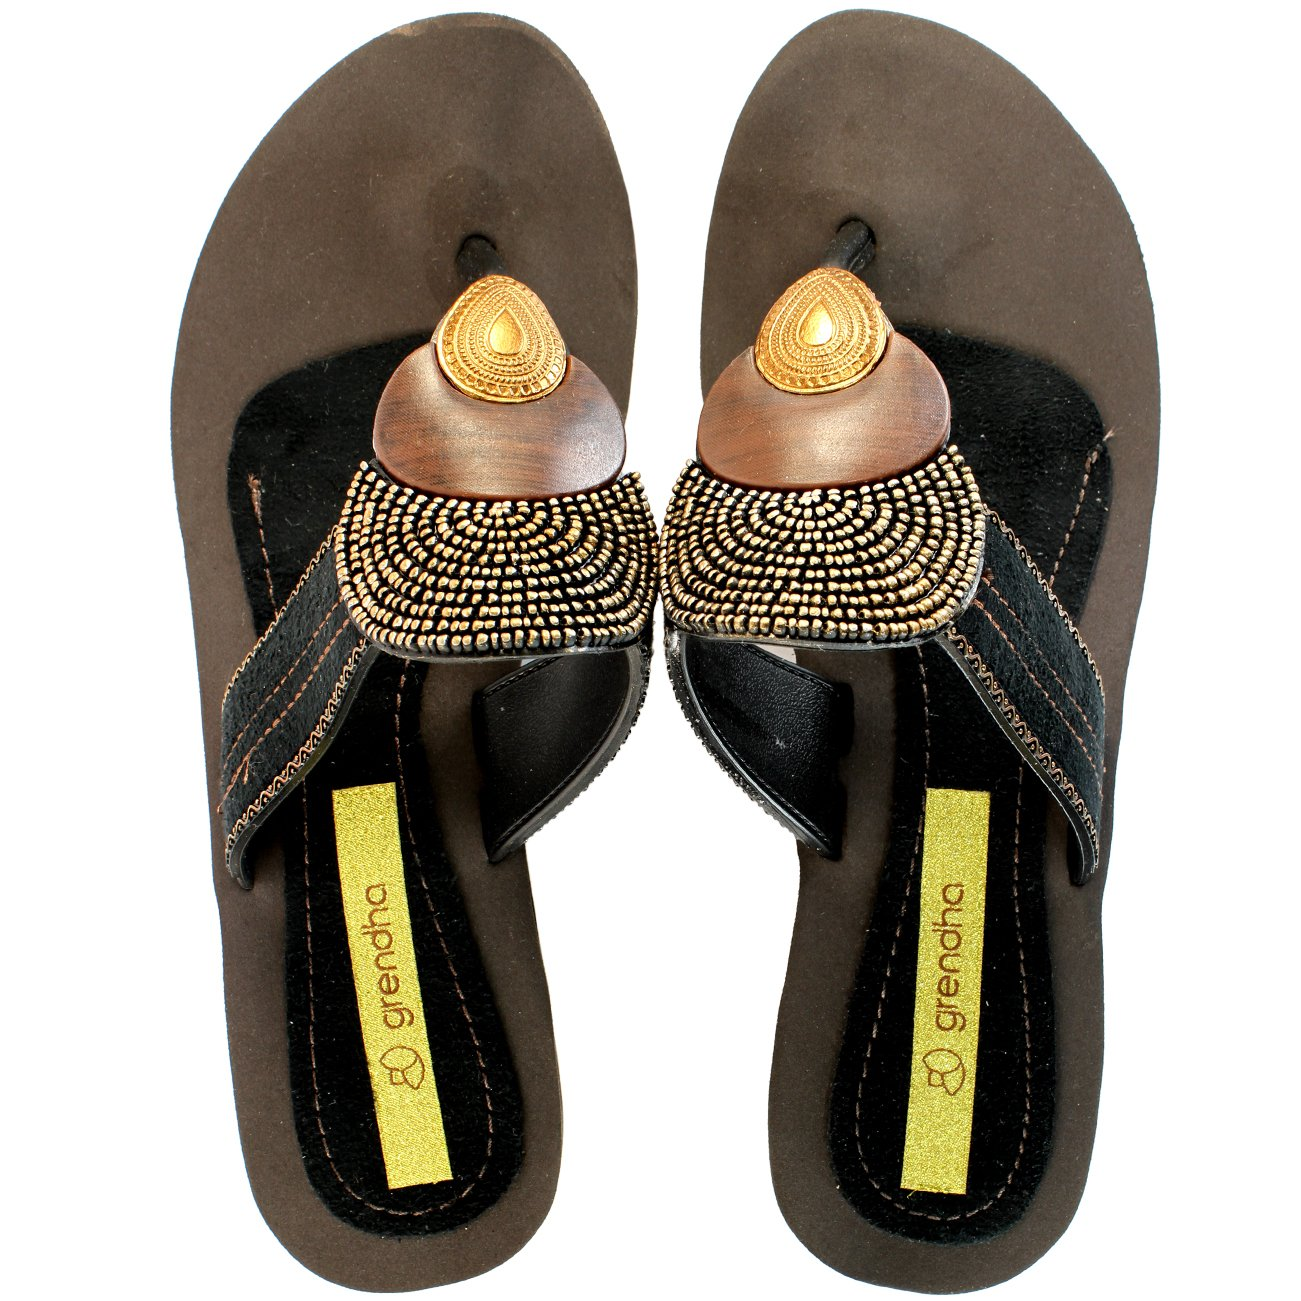 7decd1962f3 Womens Grendha Bangles Wedge Heel Sandals - Black - 11  Amazon.ca  Shoes    Handbags